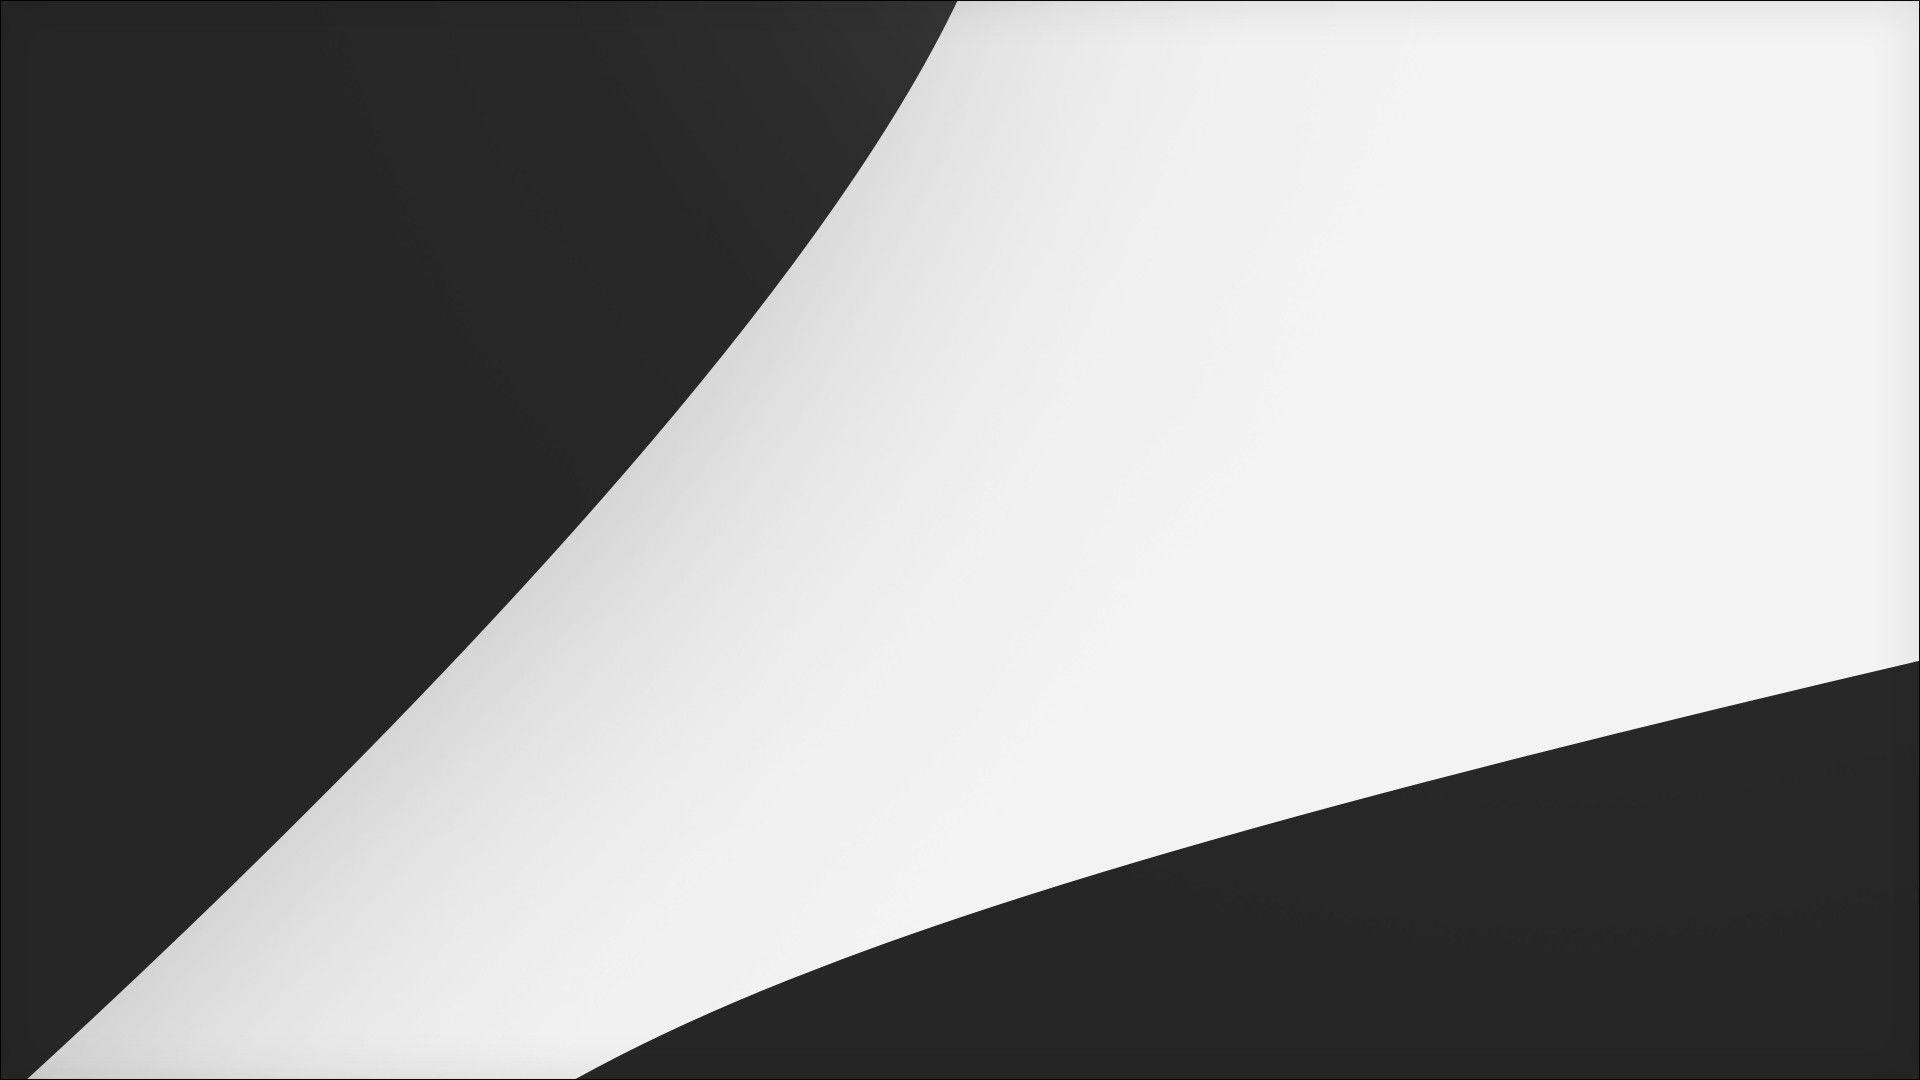 Abstract Black White Wallpaper | walluck.